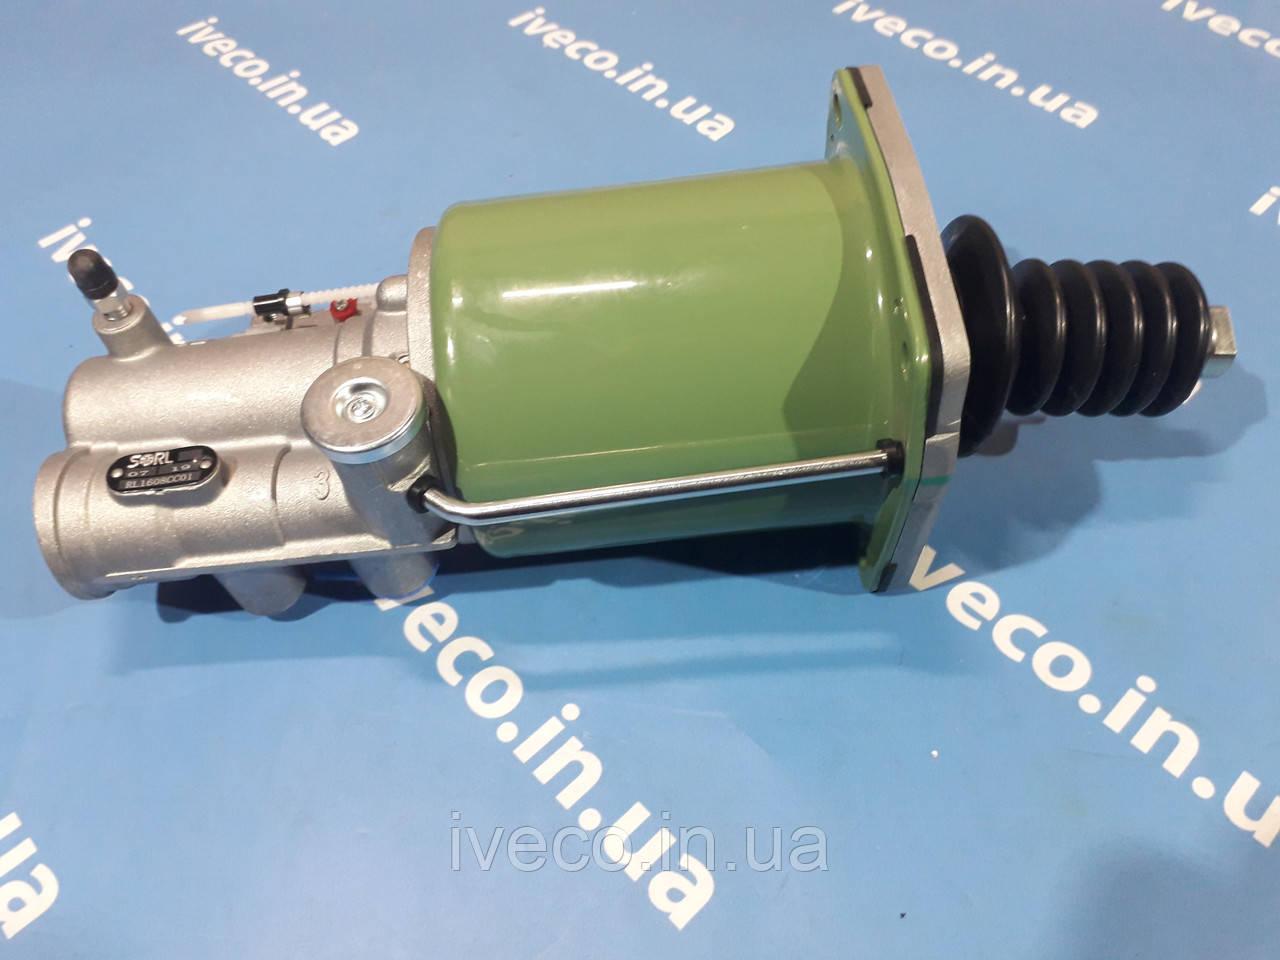 ПГУ Усилитель сцепления Iveco Eurotech Stralis Trakker EuroTrakker 41035502 98420498 VG3264 VG3269 VG3289